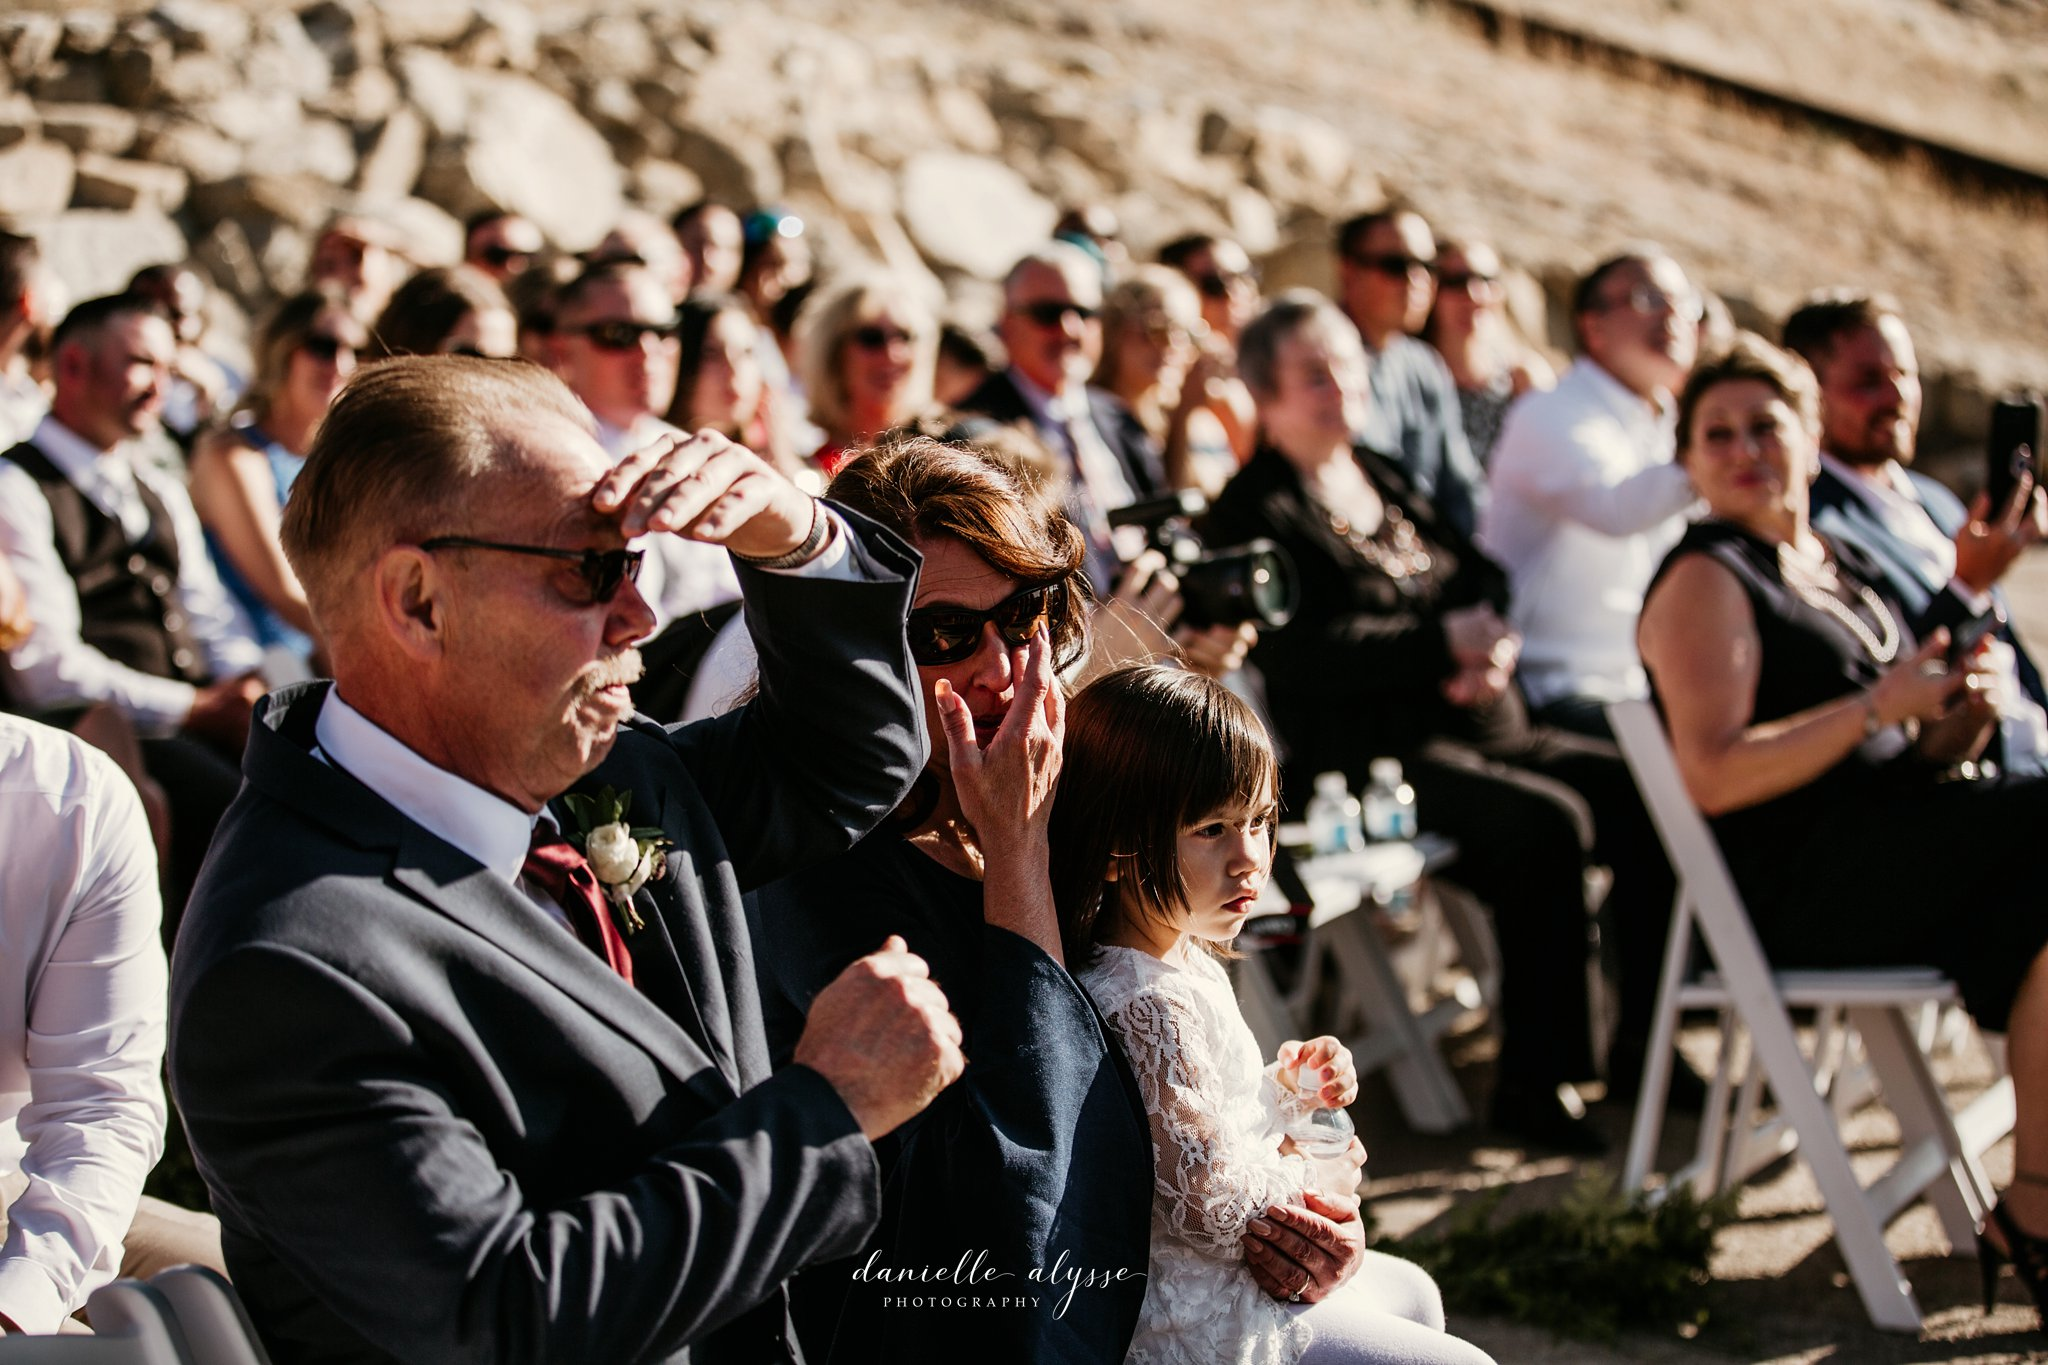 180831_wedding_stephanie_heavenly_south_lake_tahoe_danielle_alysse_photography_destination_blog_695_WEB.jpg